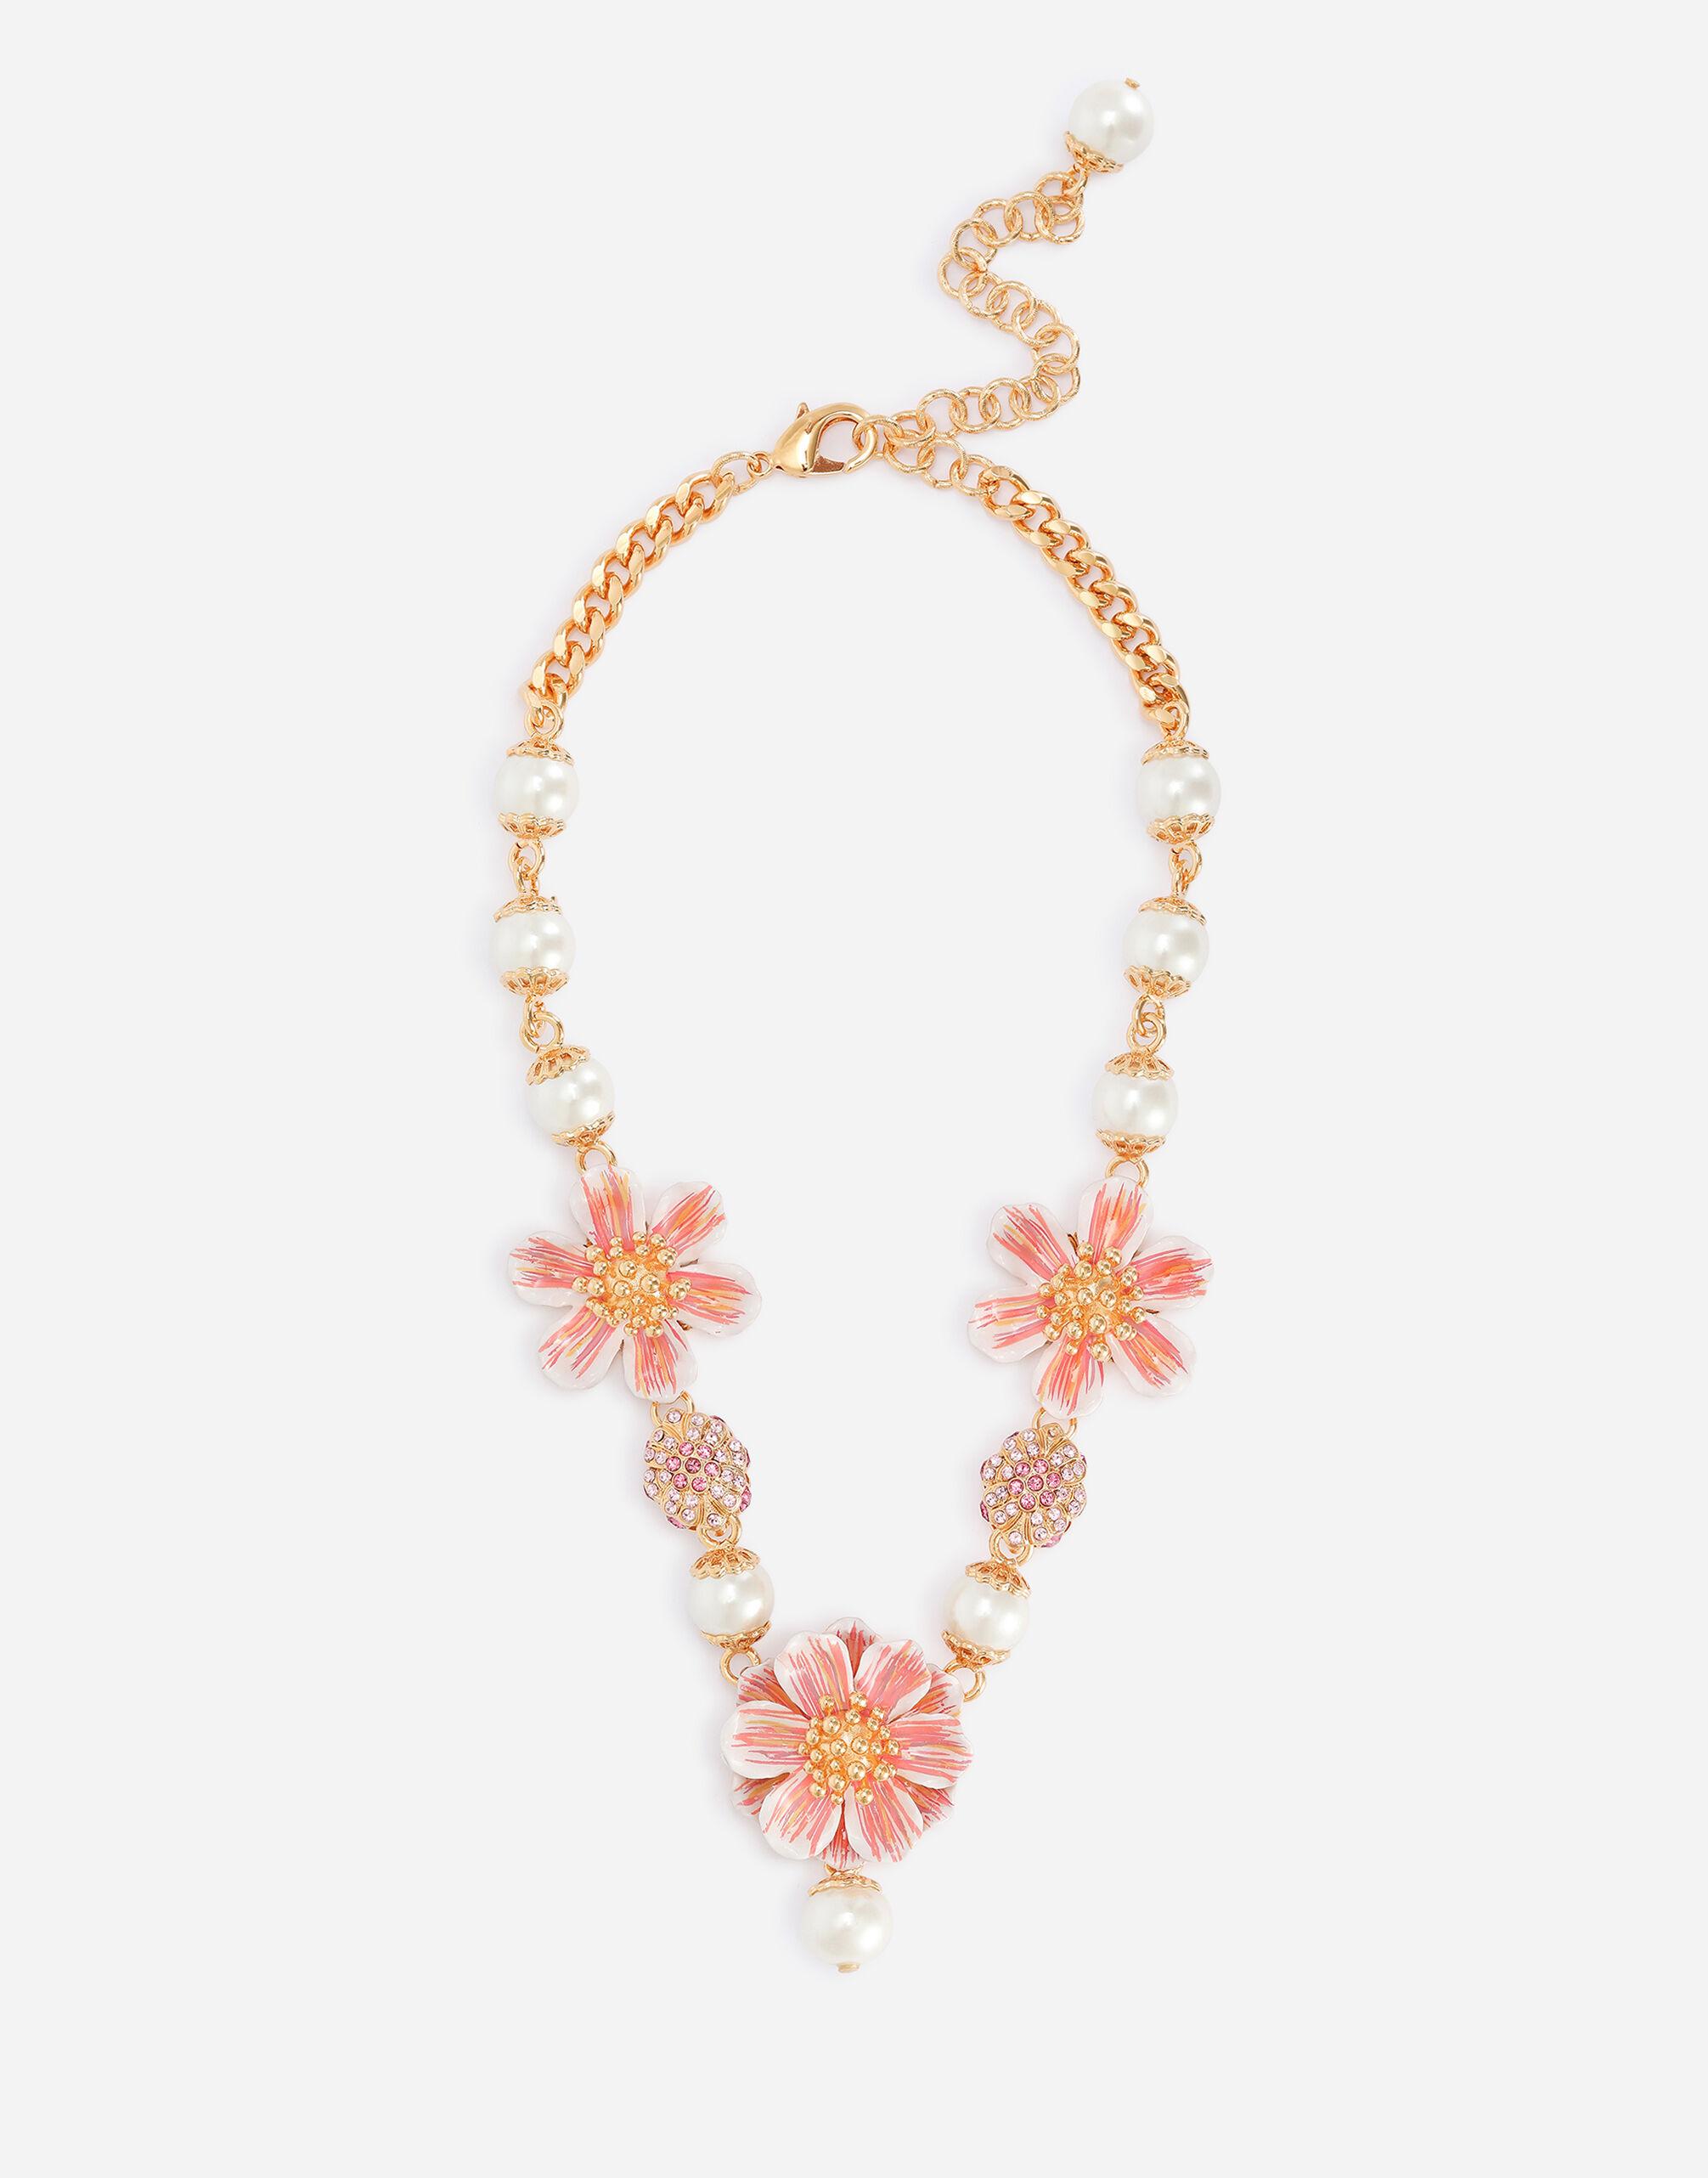 Collana con fiore pendente e perle in resina